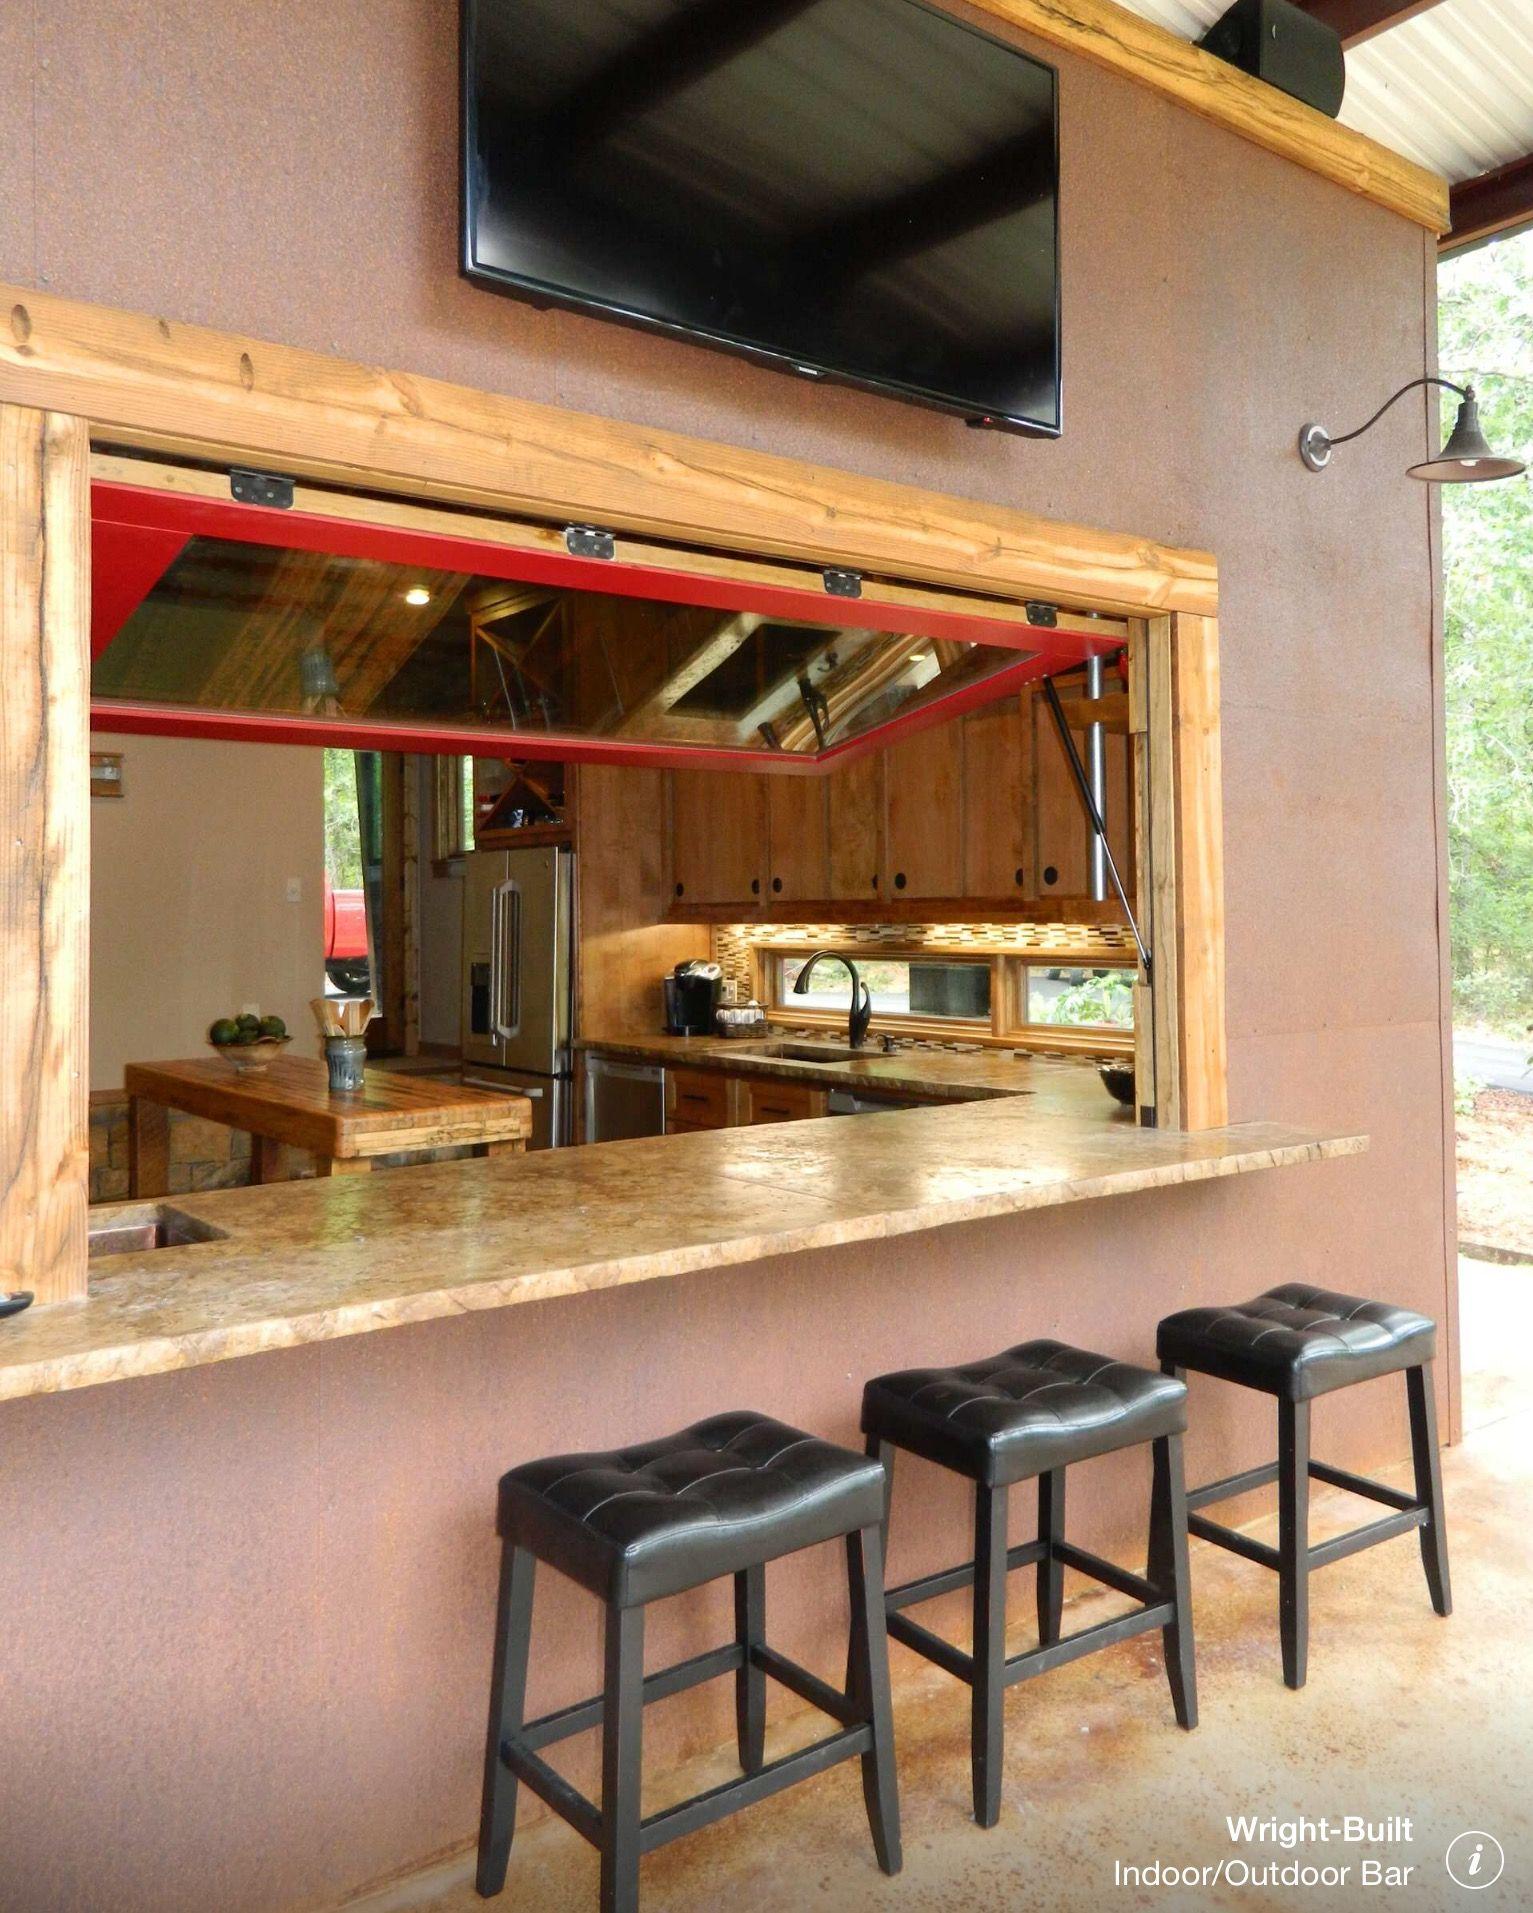 Bar outside kitchen window  pin by matt on kitchen in   pinterest  backyard bar and pool